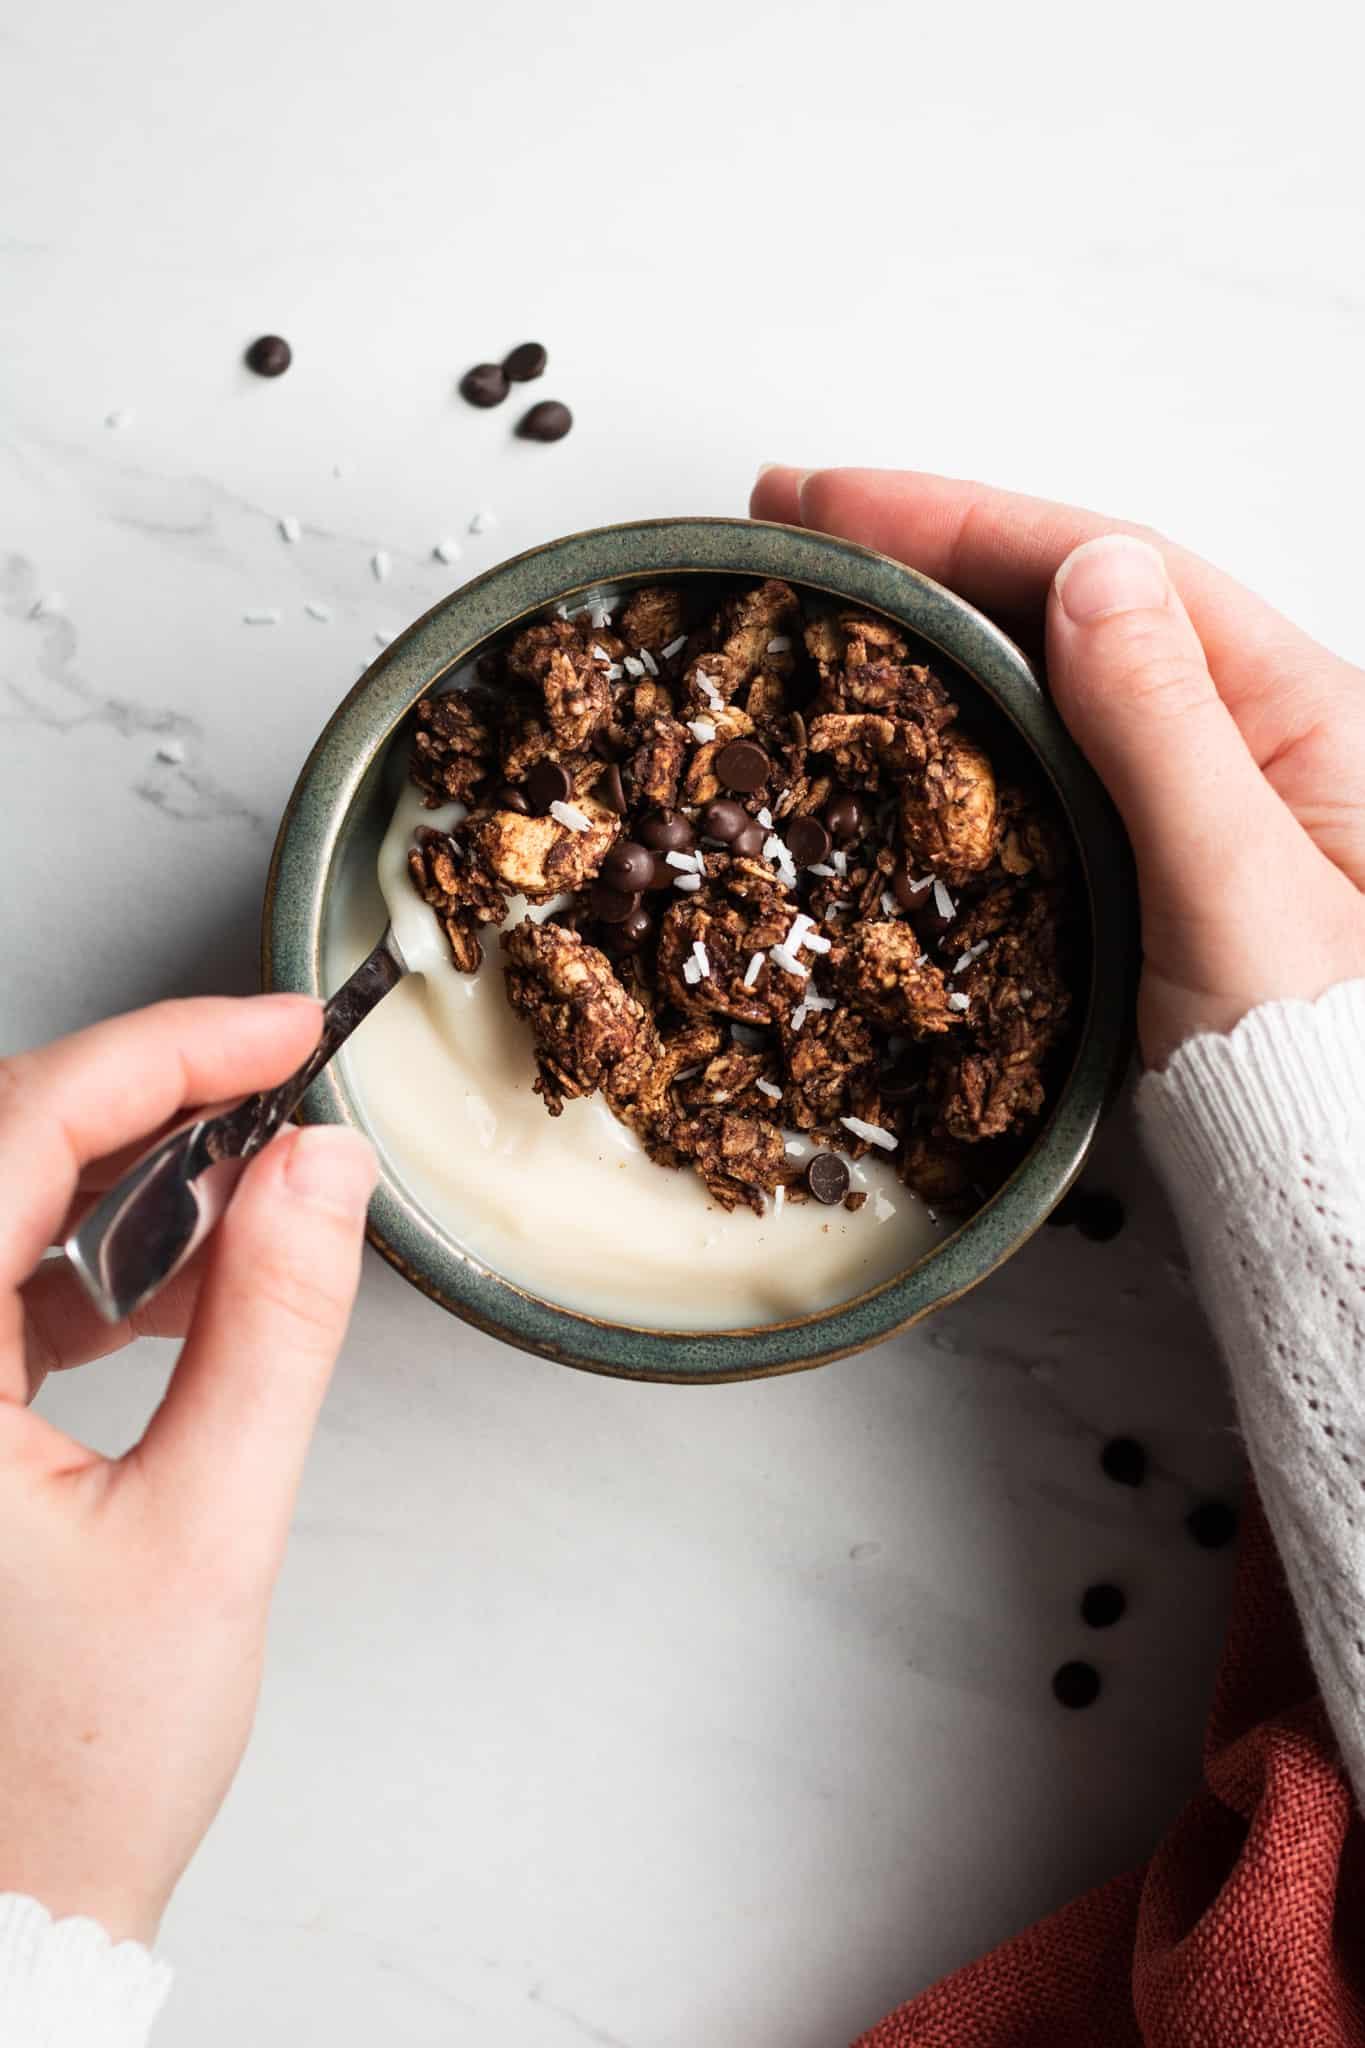 hand holding a bowl of granola with yogurt